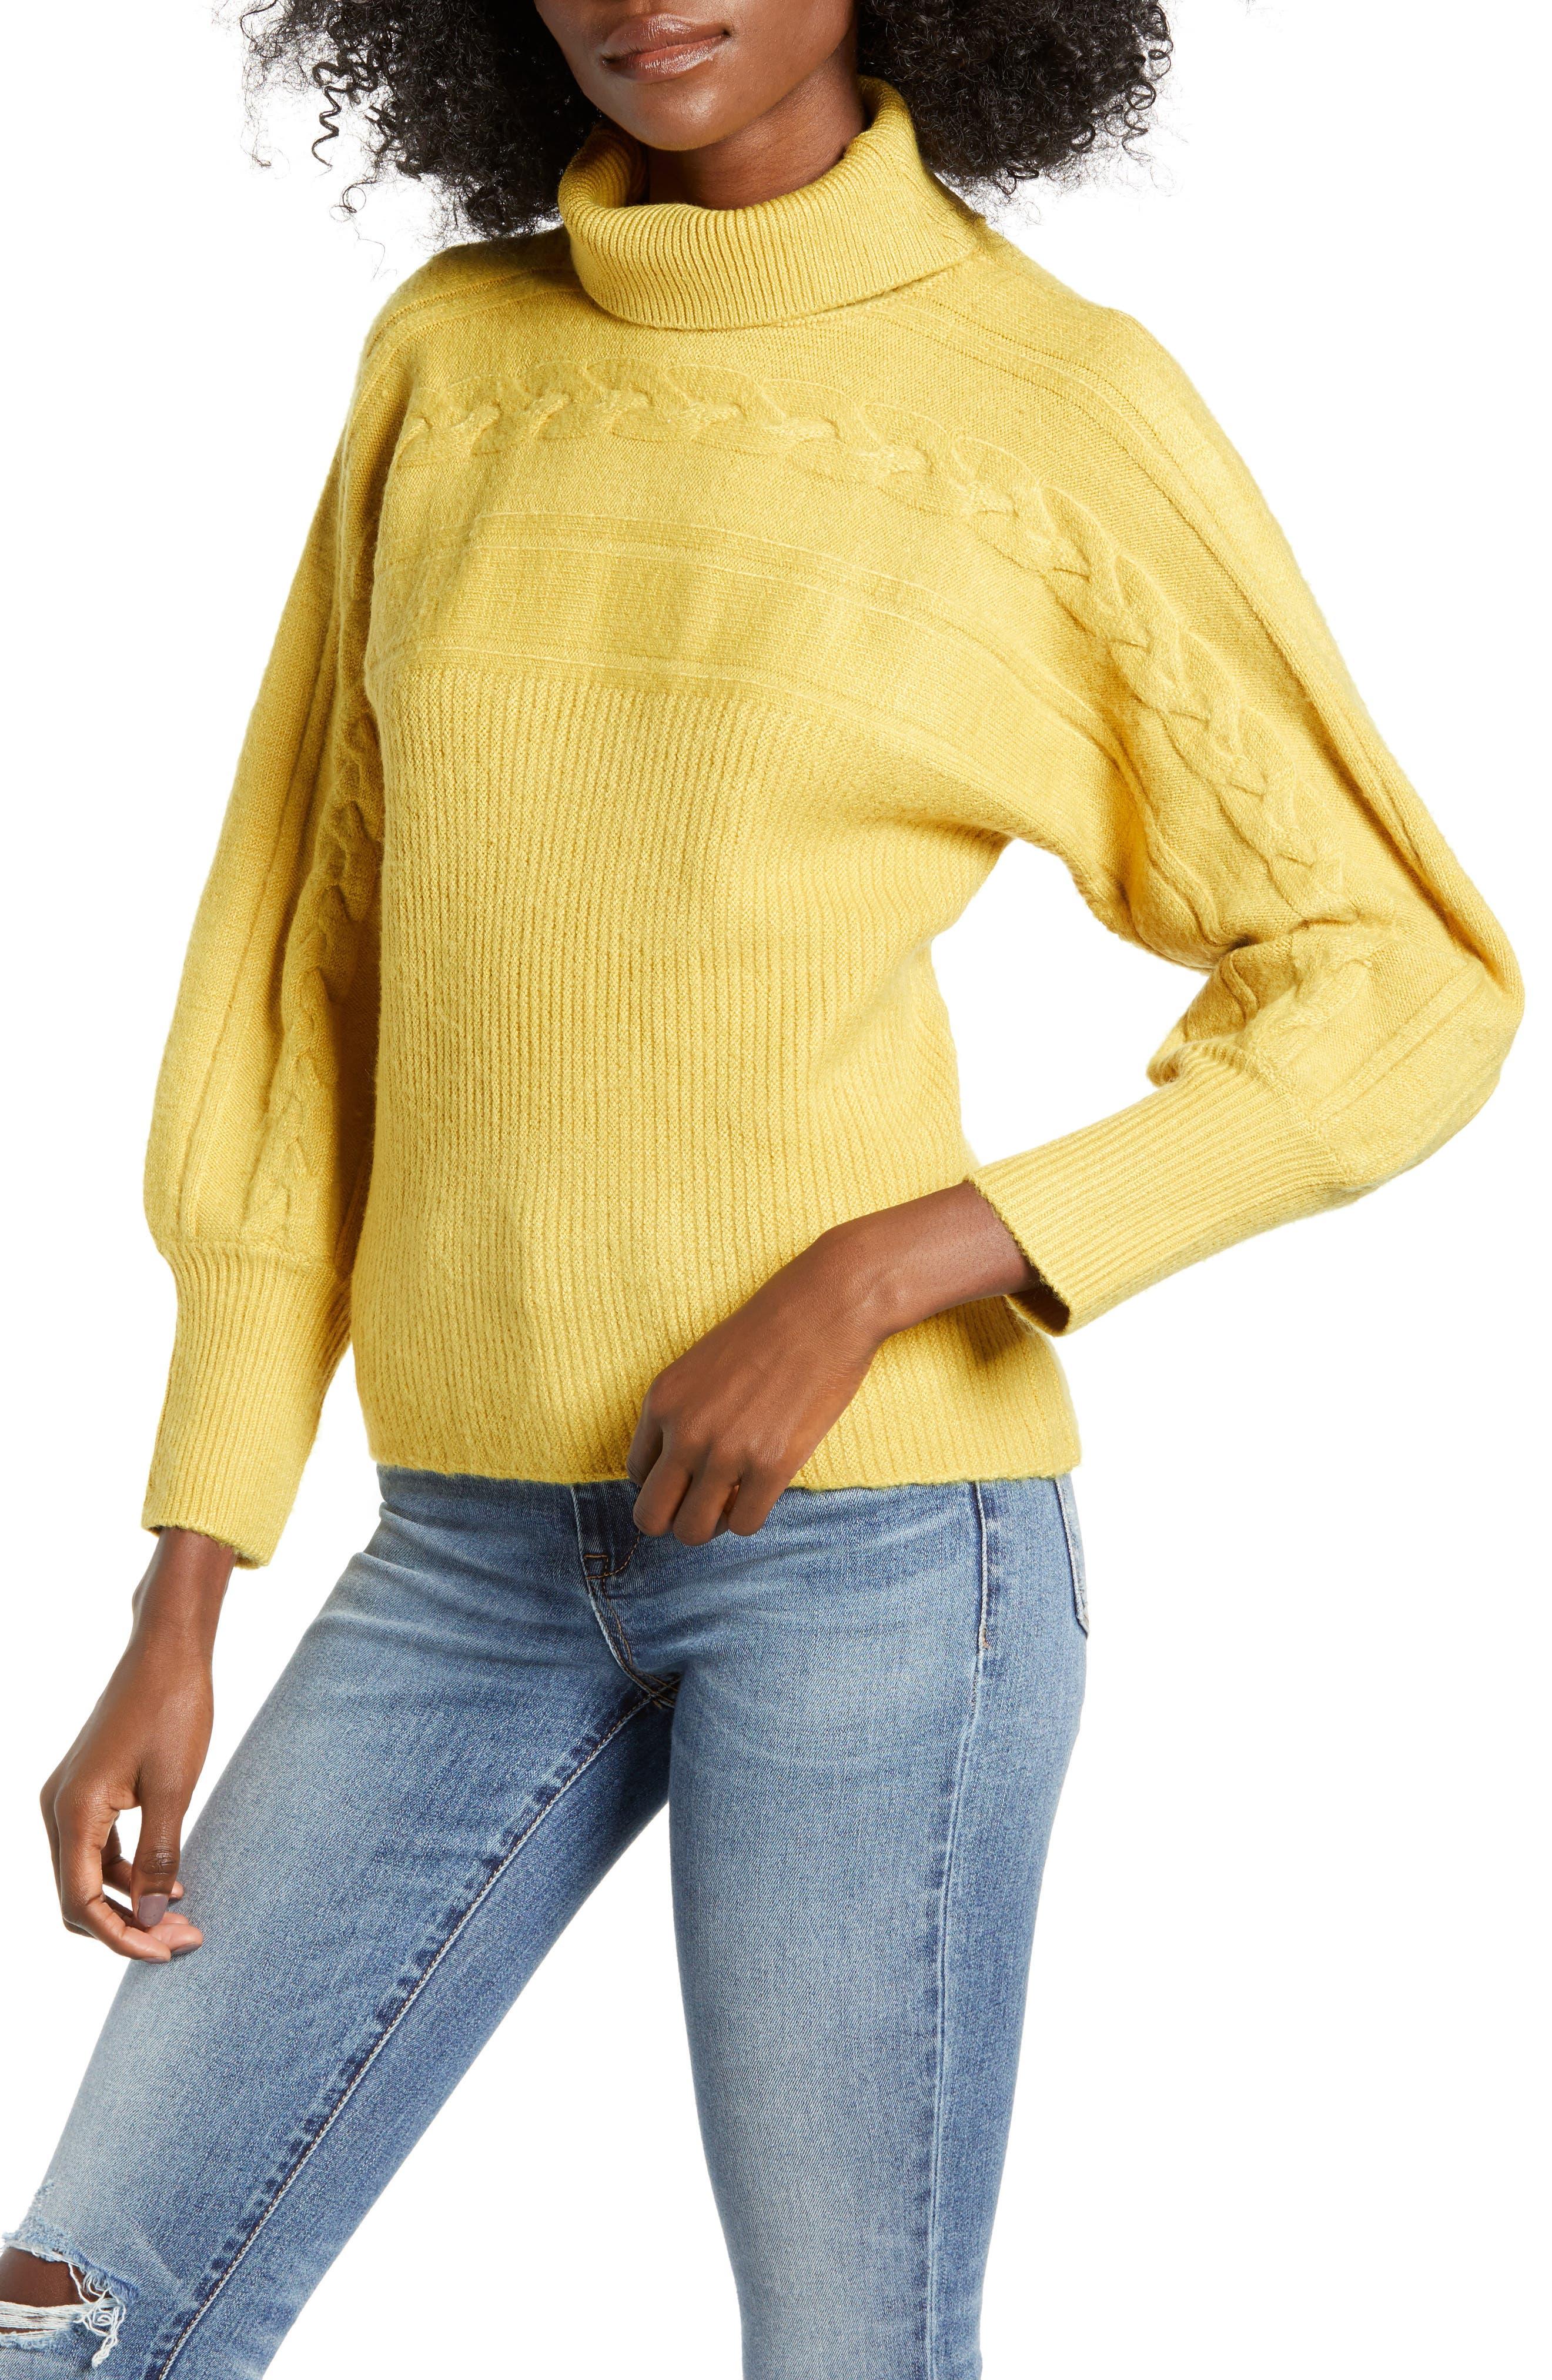 JOA Bishop Sleeve Turtleneck Sweater in Marigold